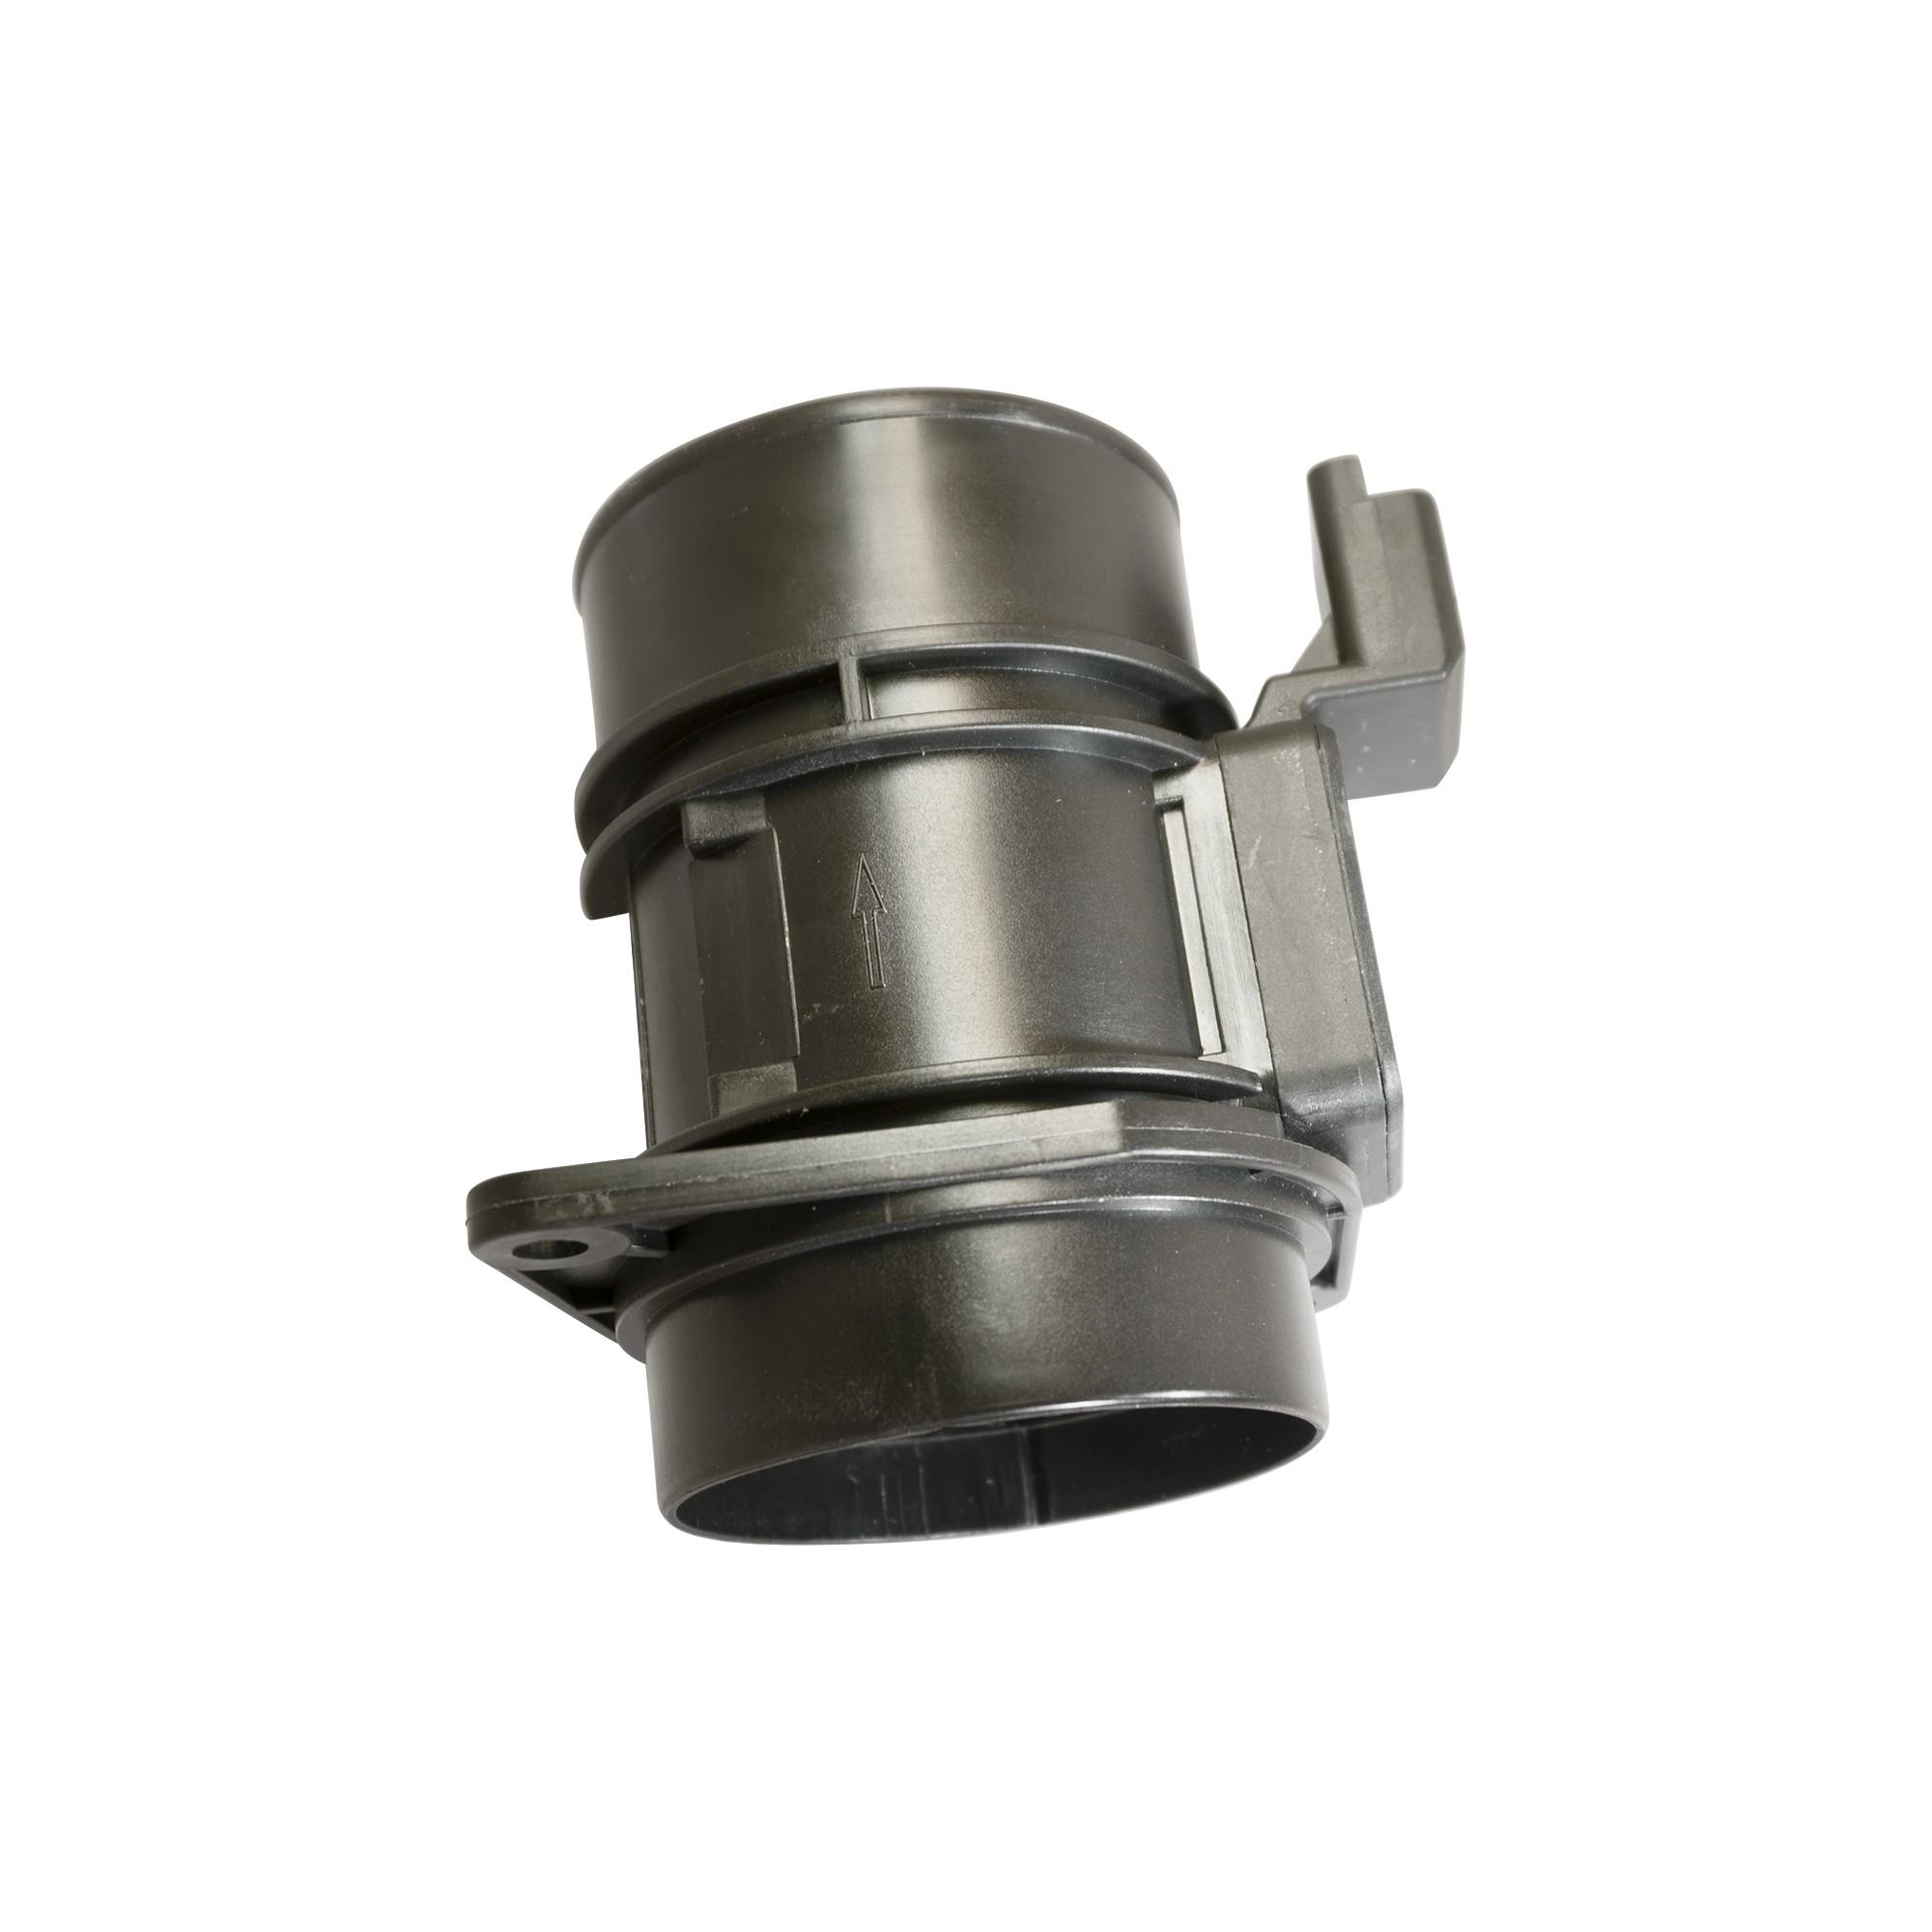 For NISSAN PRIMASTAR Box OPEL ABS Mass Air Flow Meter Sensor MAF 7700104426